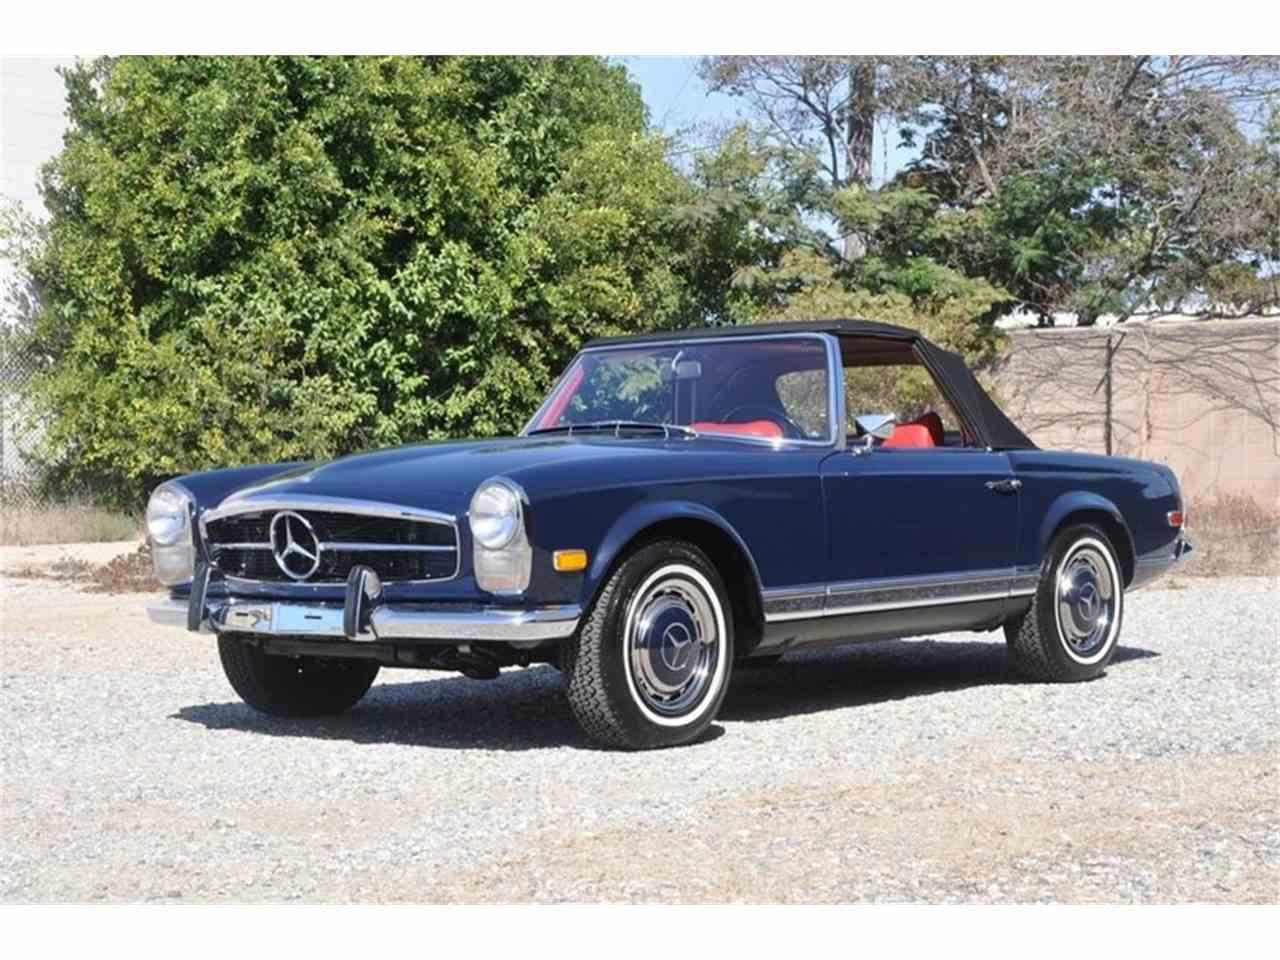 Large Picture of 1969 Mercedes-Benz 280SL - $169,500.00 - JFPJ